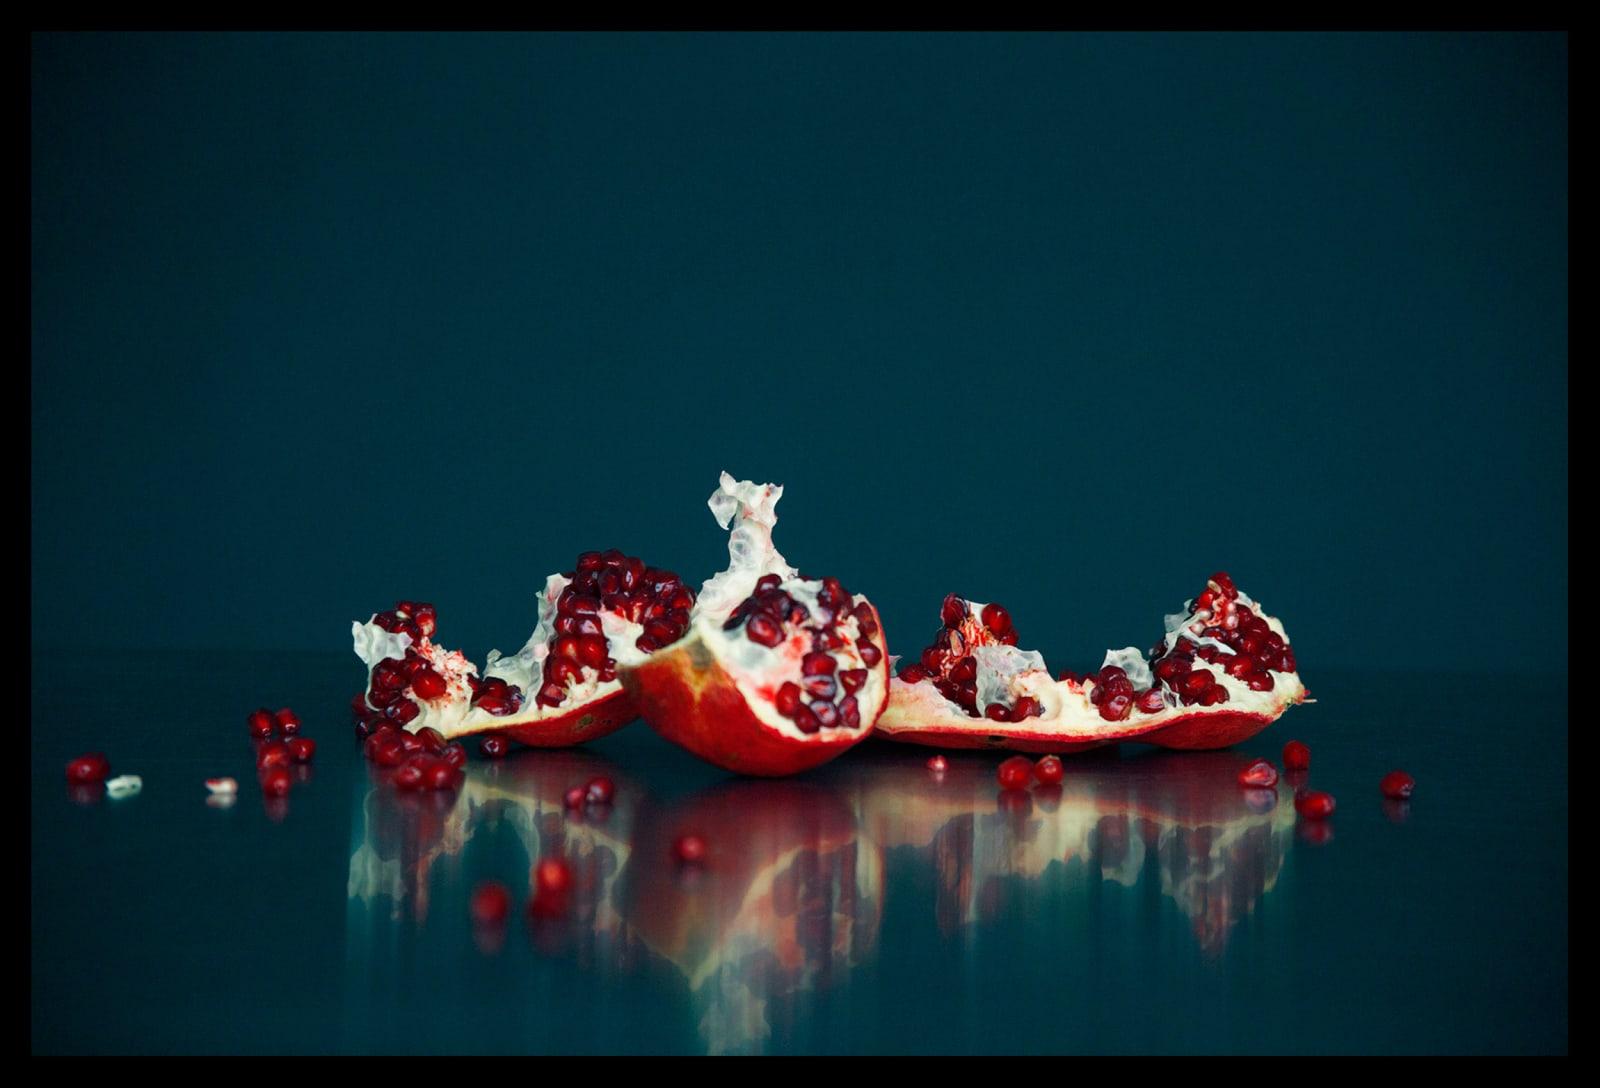 Erik Madigan Heck, Pomegranates, 2017